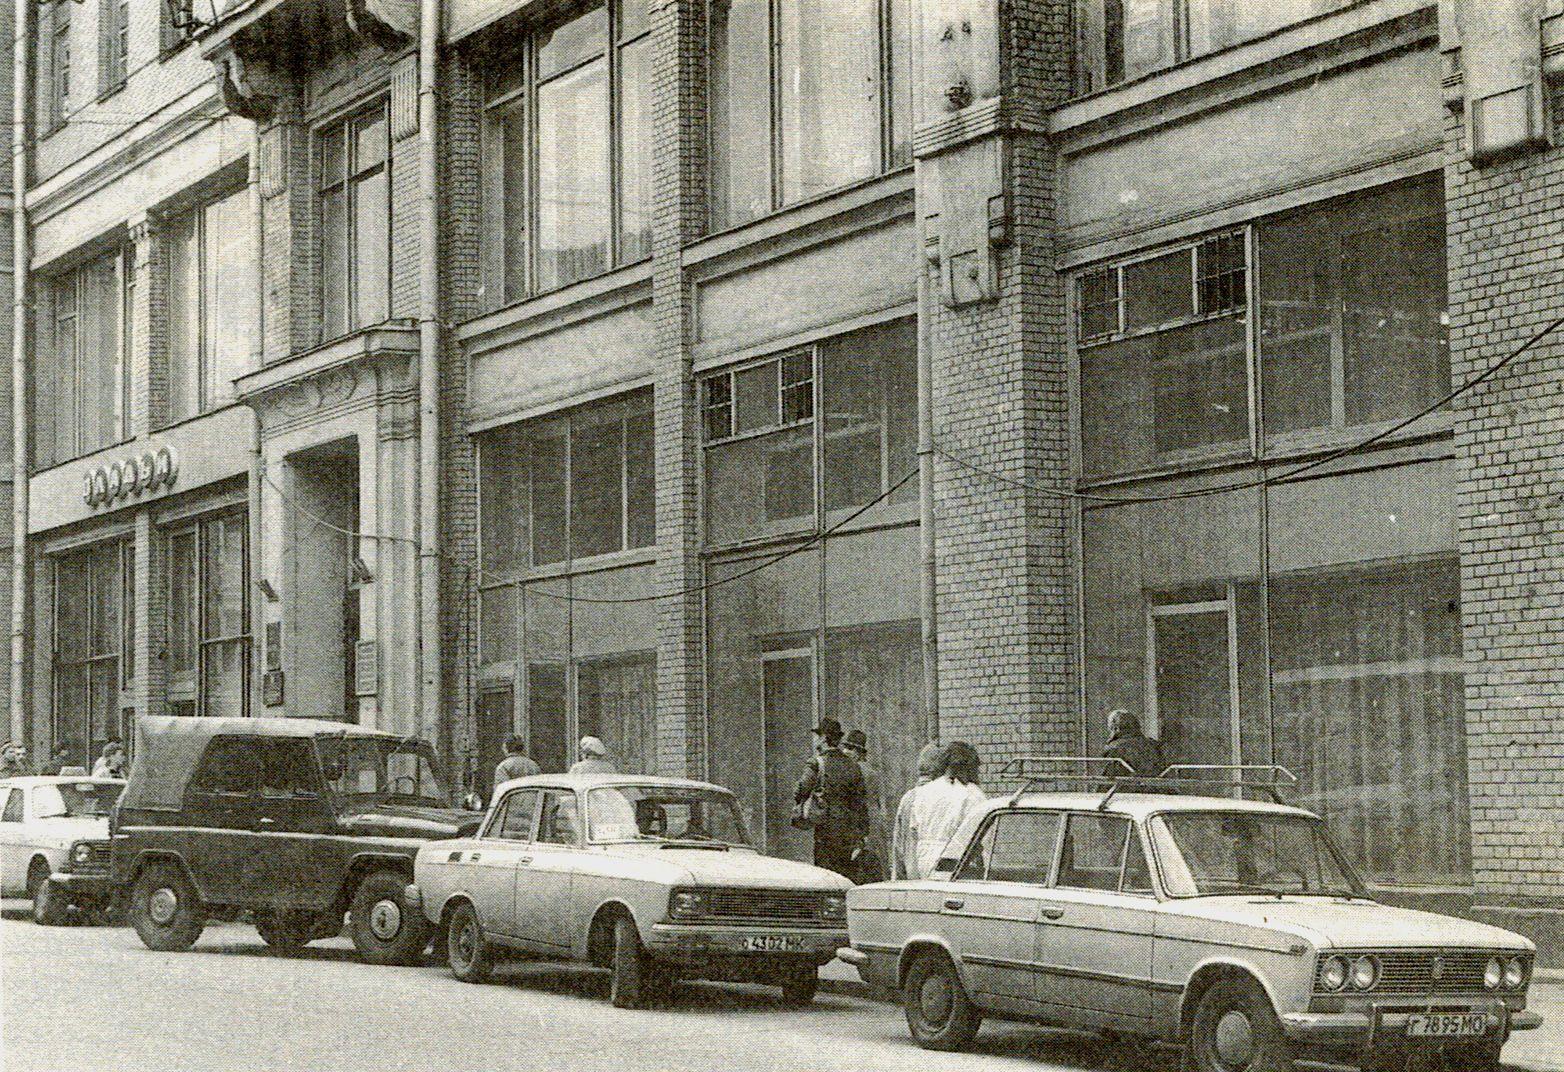 46951 Современный вид дома на Пушкинской ул.в котором жил Н.Л.Тарасов сер. 1980-х гг.jpg